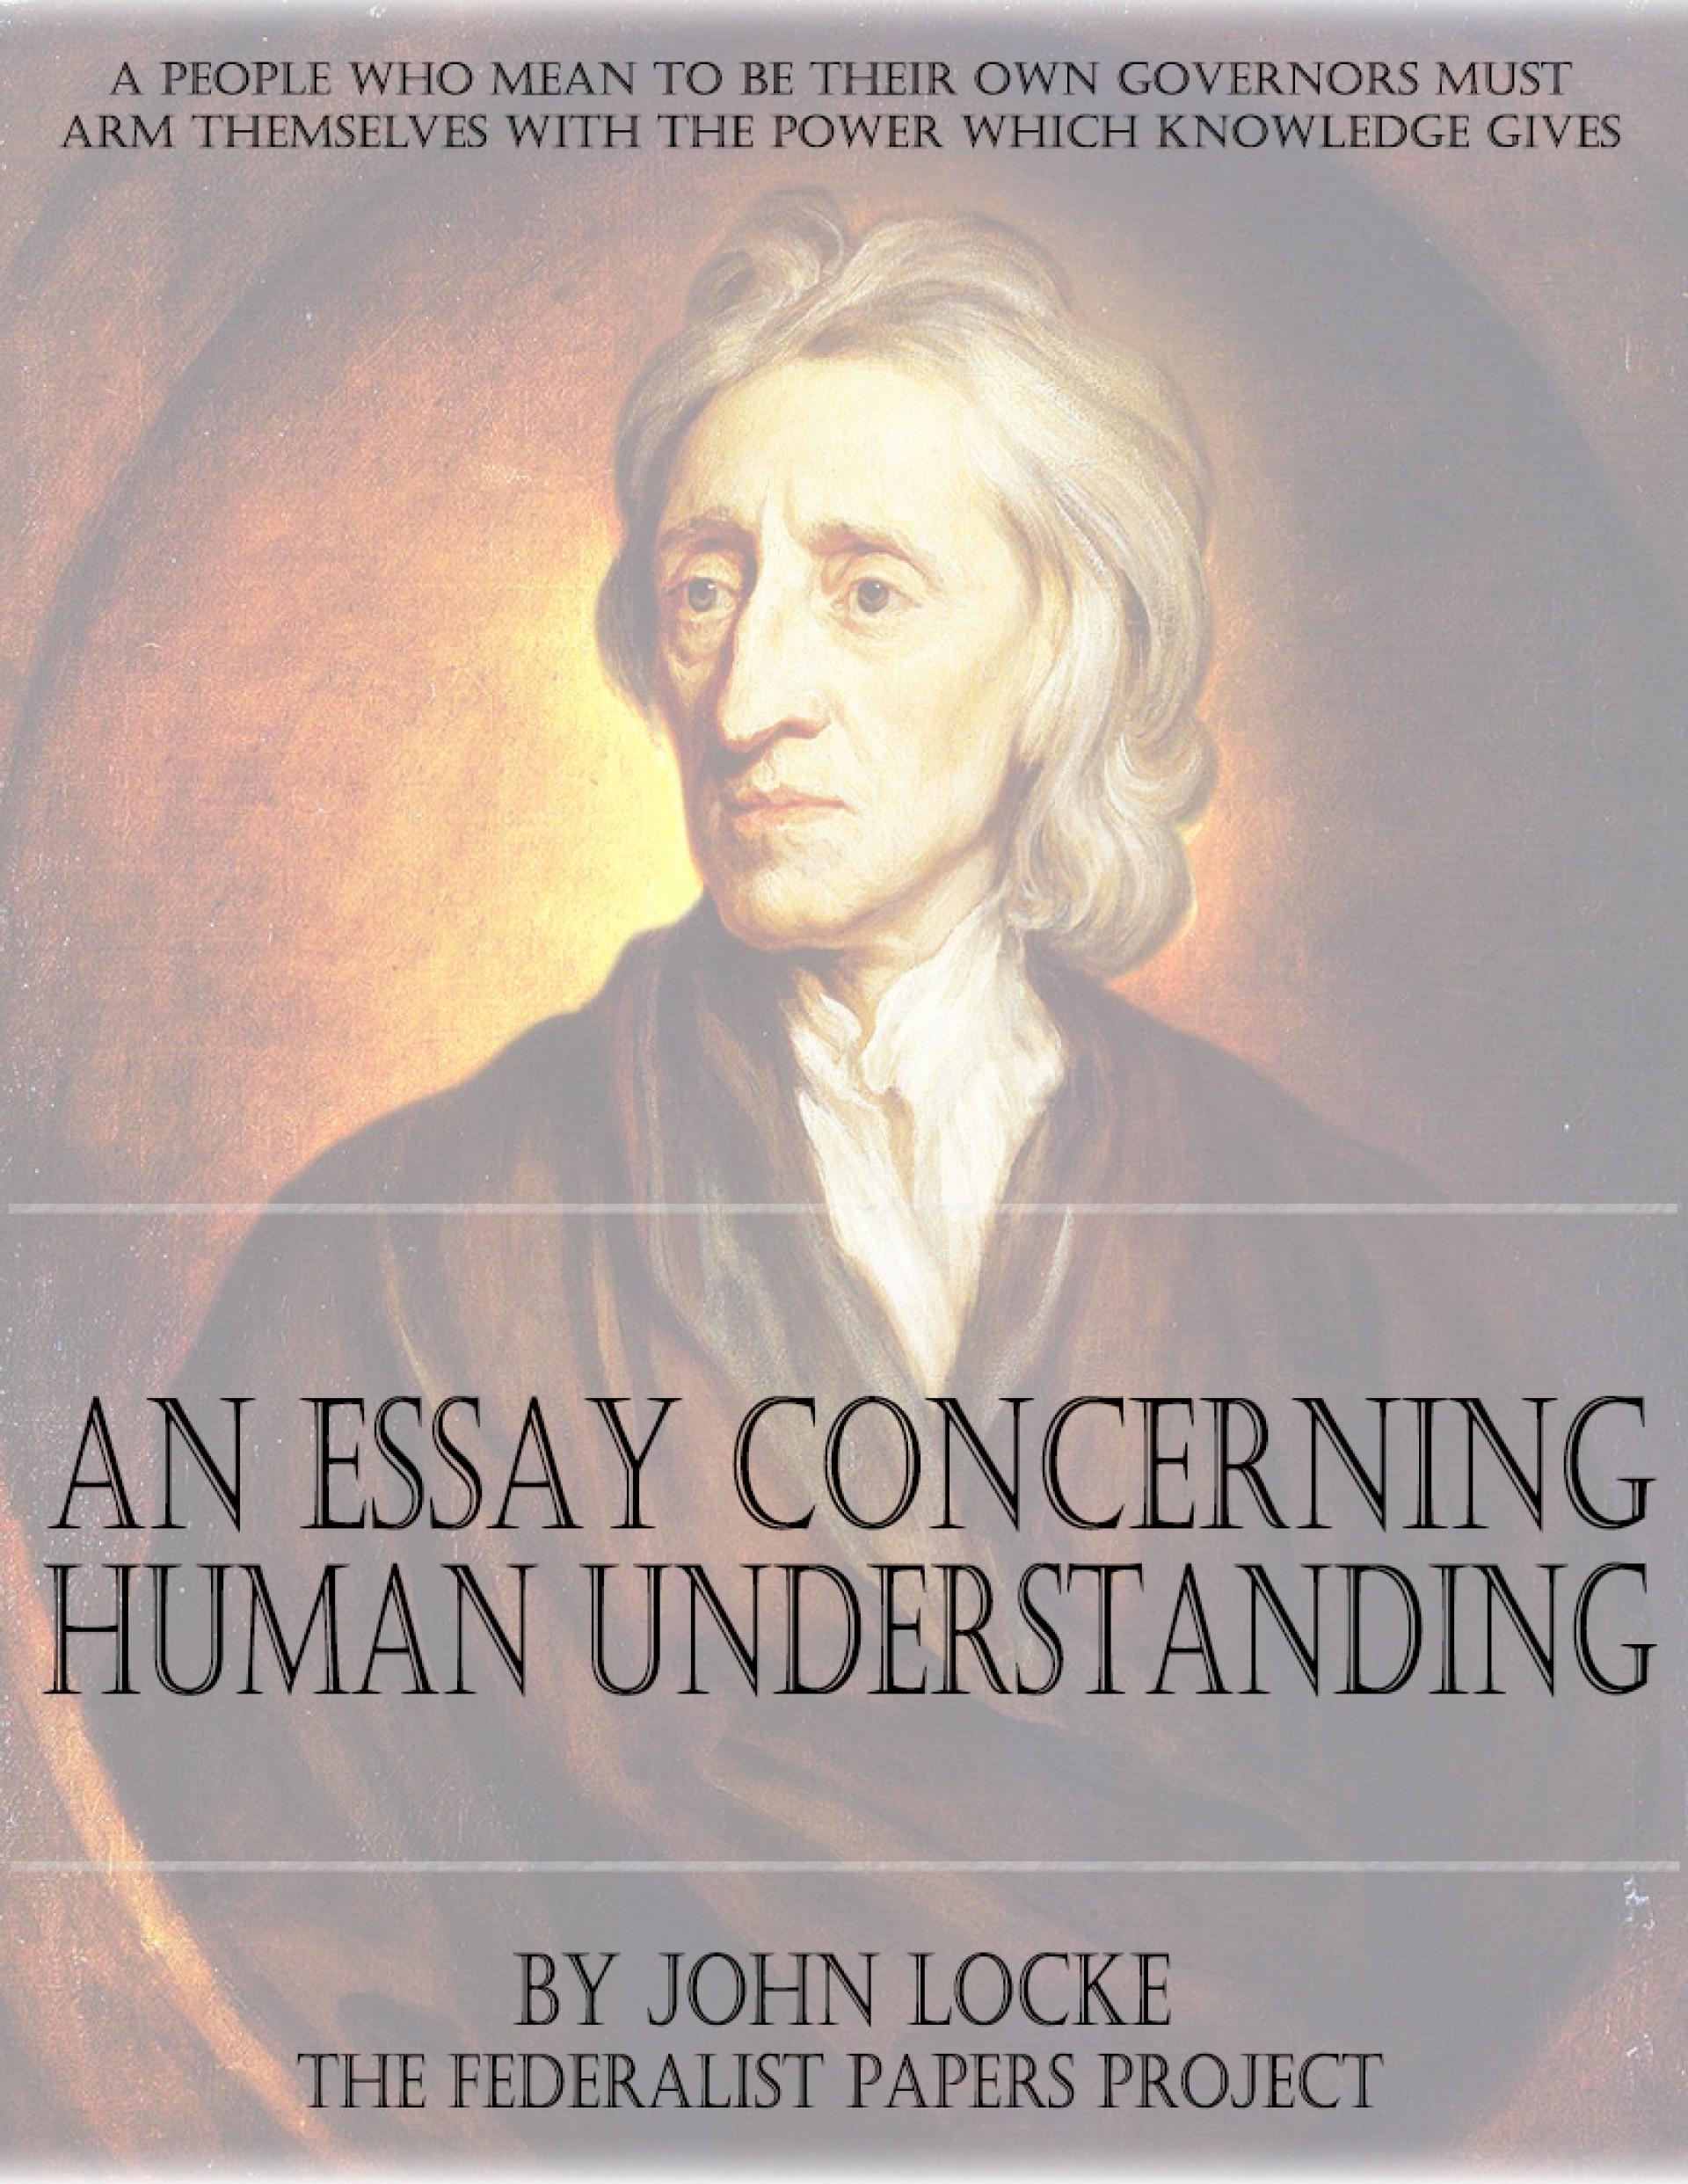 007 John Locke Essay An Concerning Human Understanding Cover Page1 Impressive Book 4 On Pdf Summary 1920